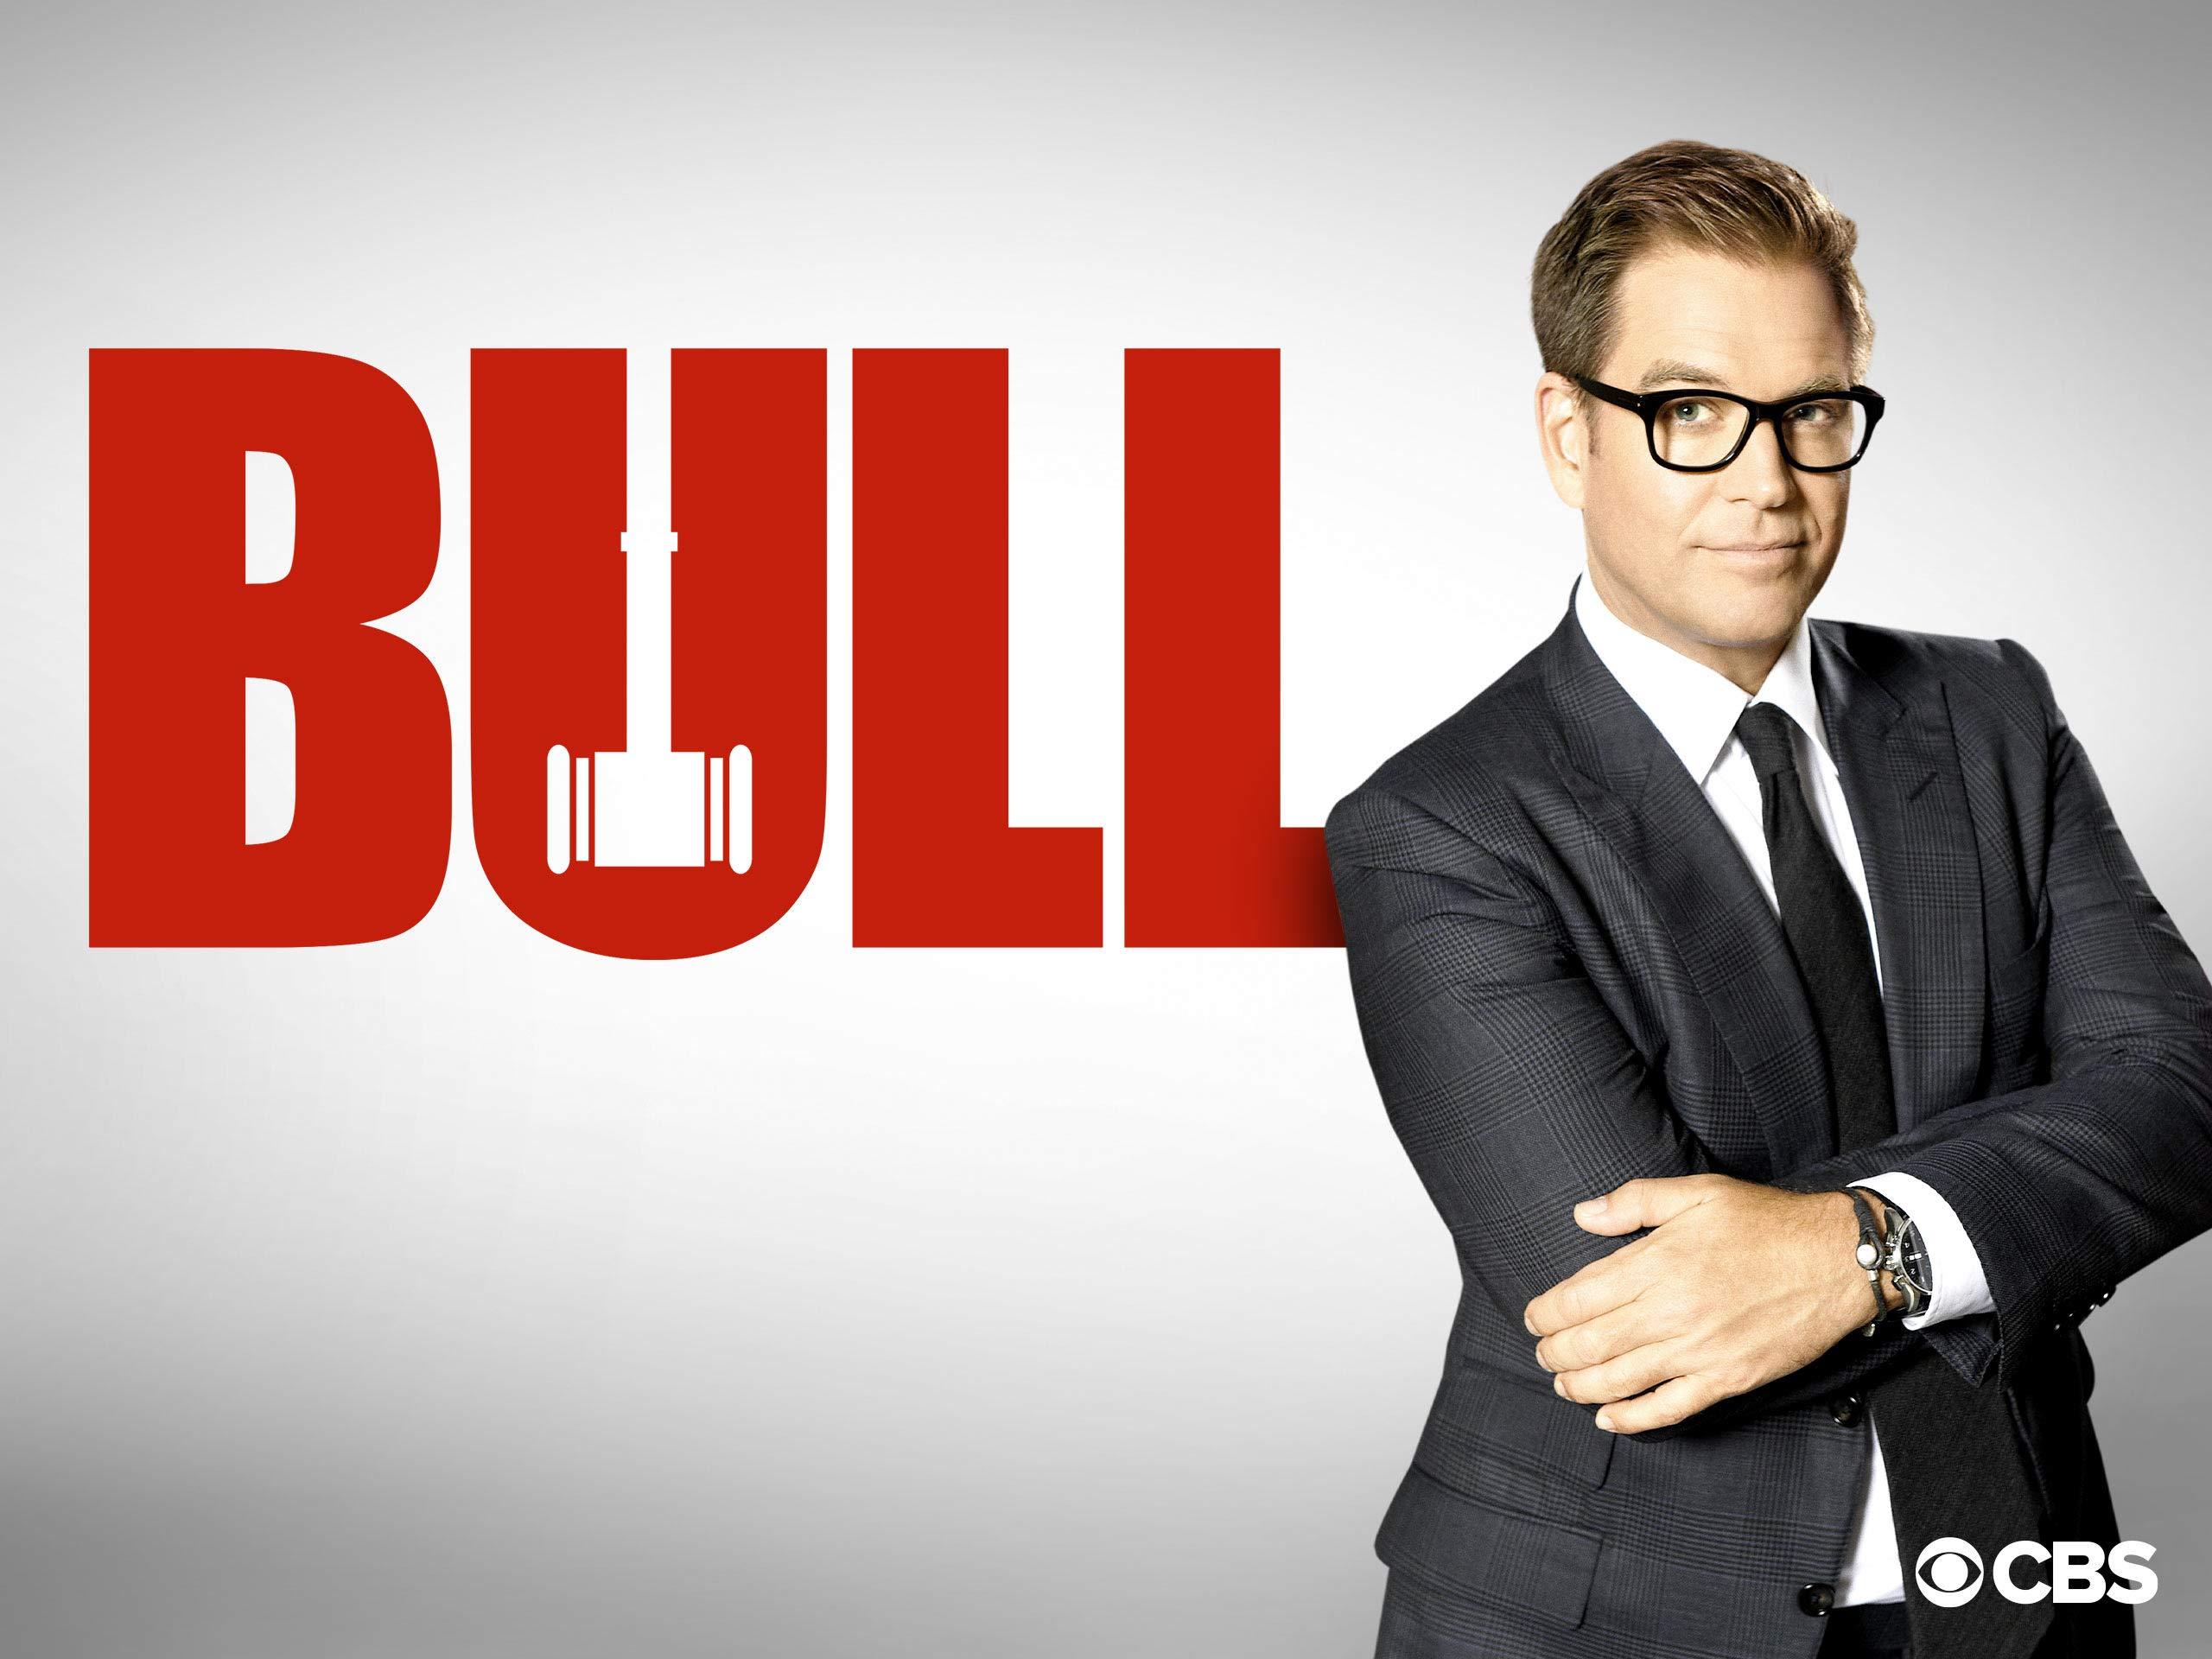 Bull (2016) Season 6 Episode 2: Release Date & Preview